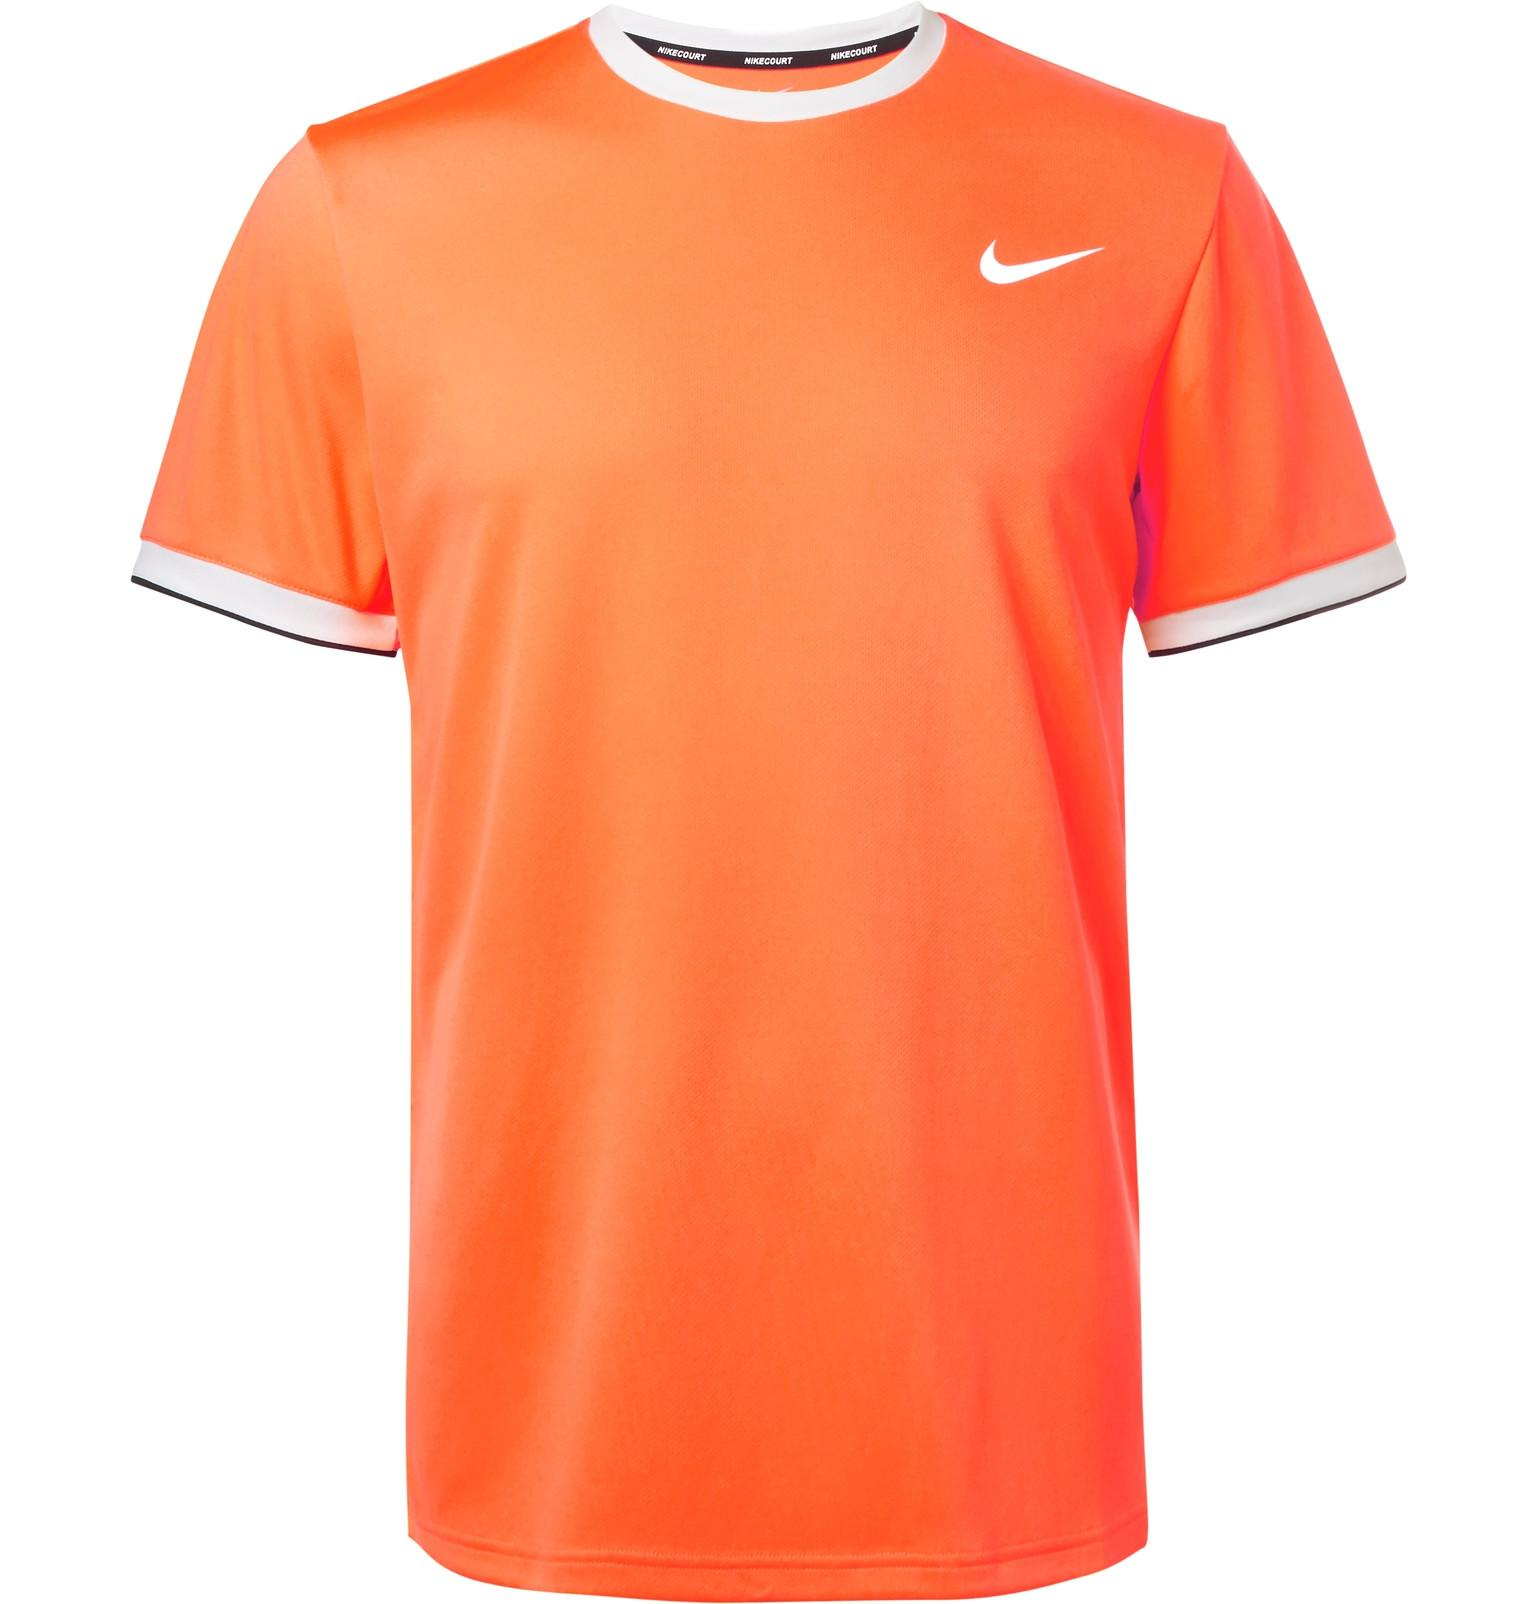 Nike Nikecourt Dry Dri Fit Mesh Tennis T Shirt In Orange